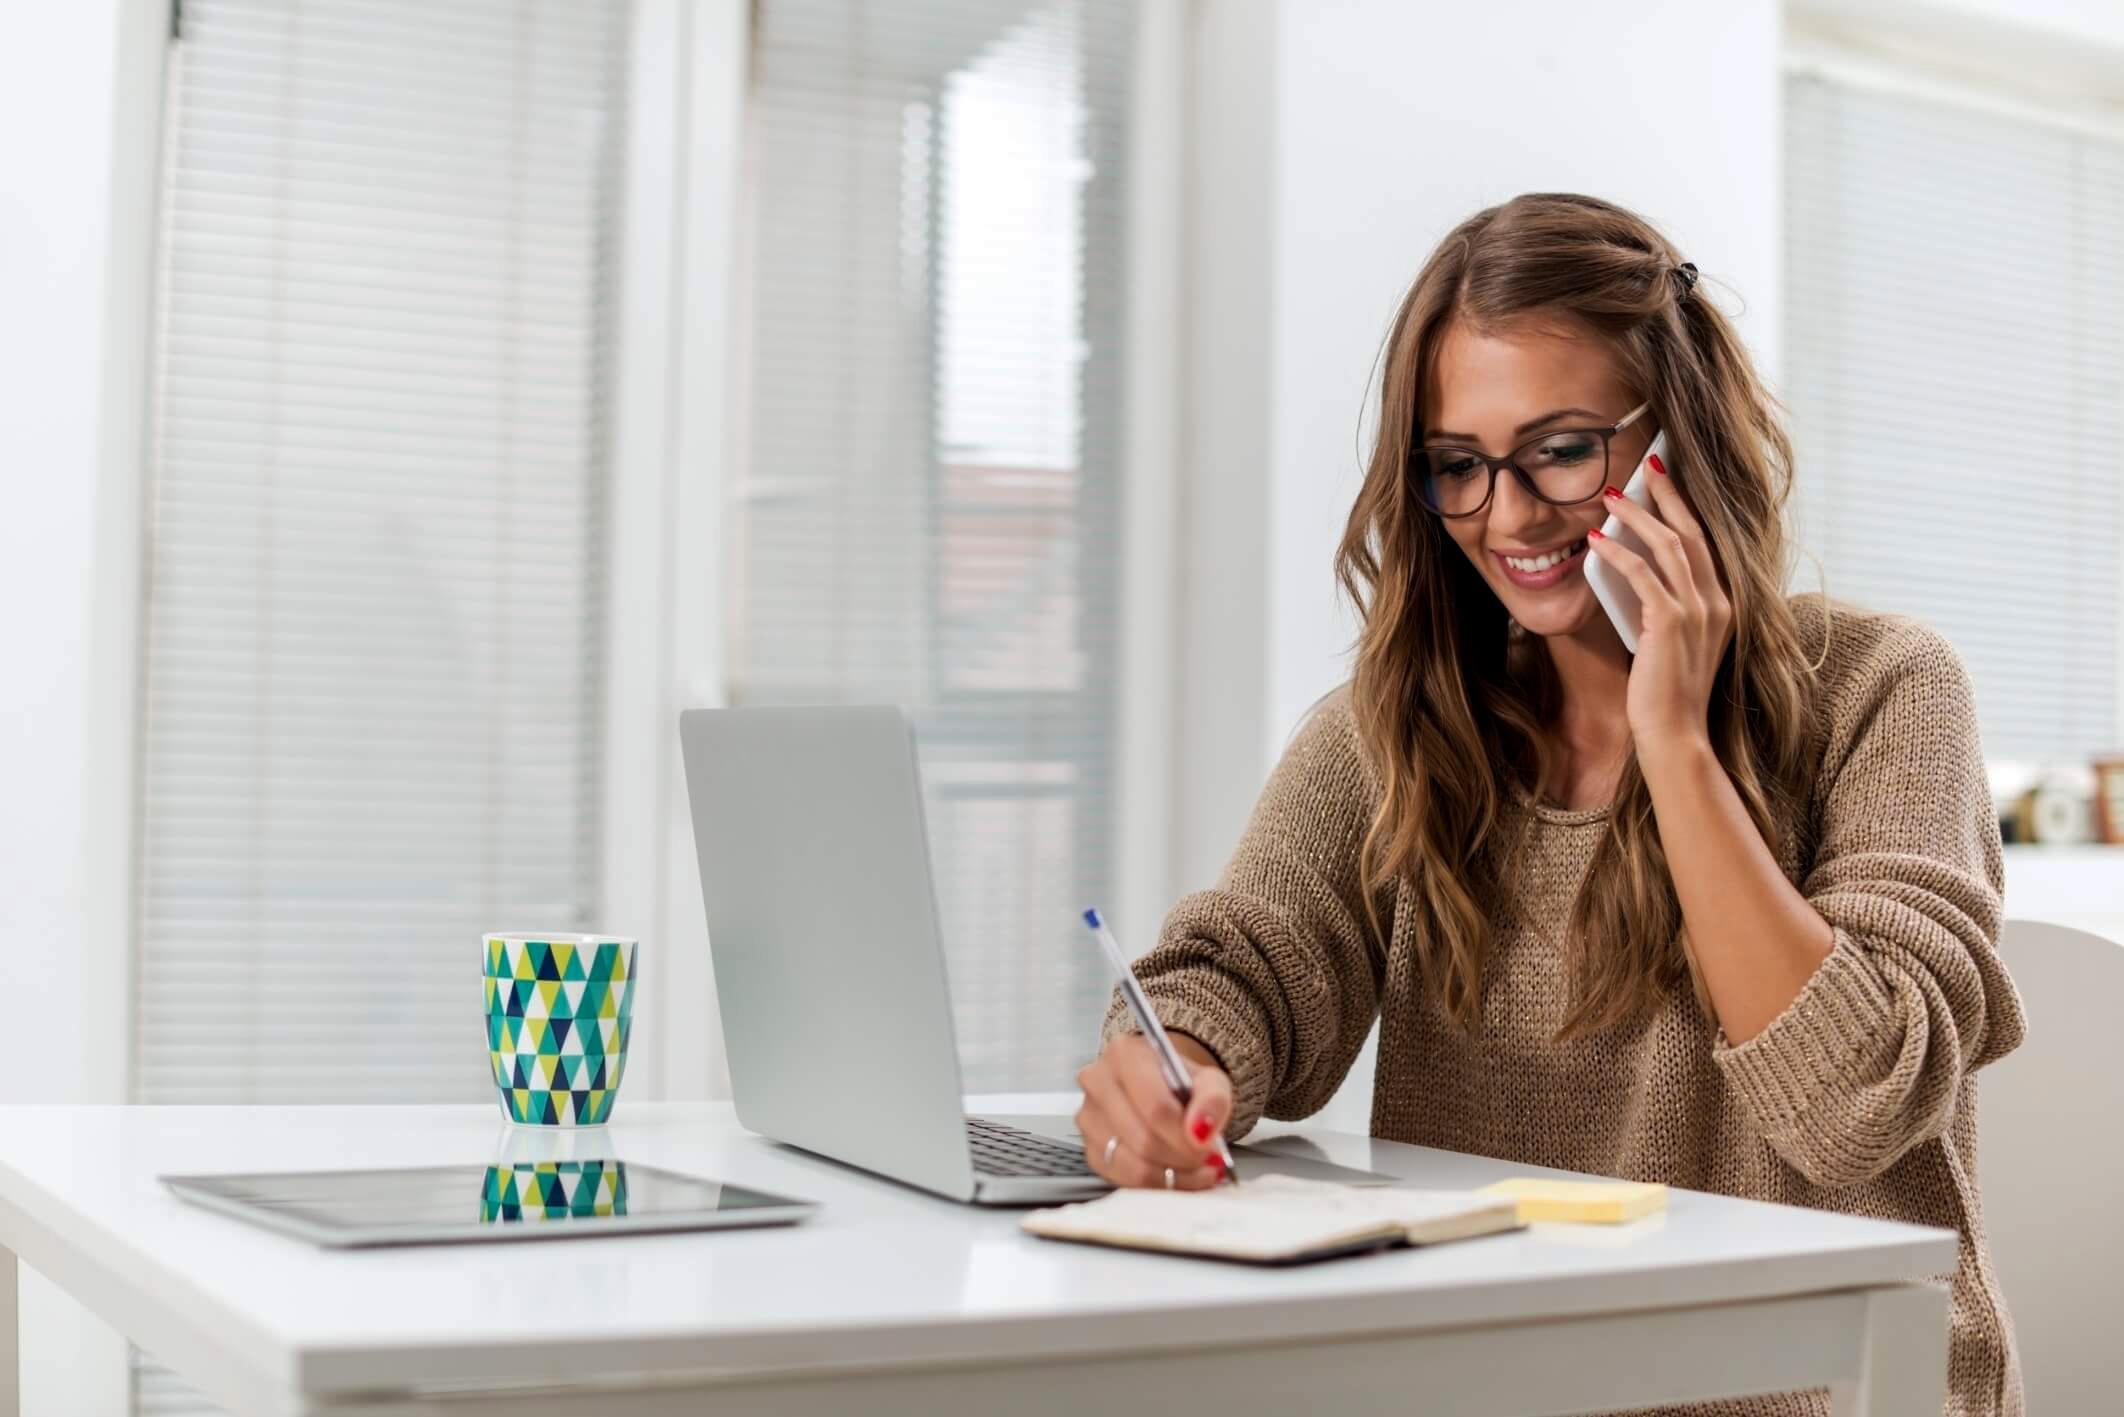 6 Consejos para reinventarnos con éxito